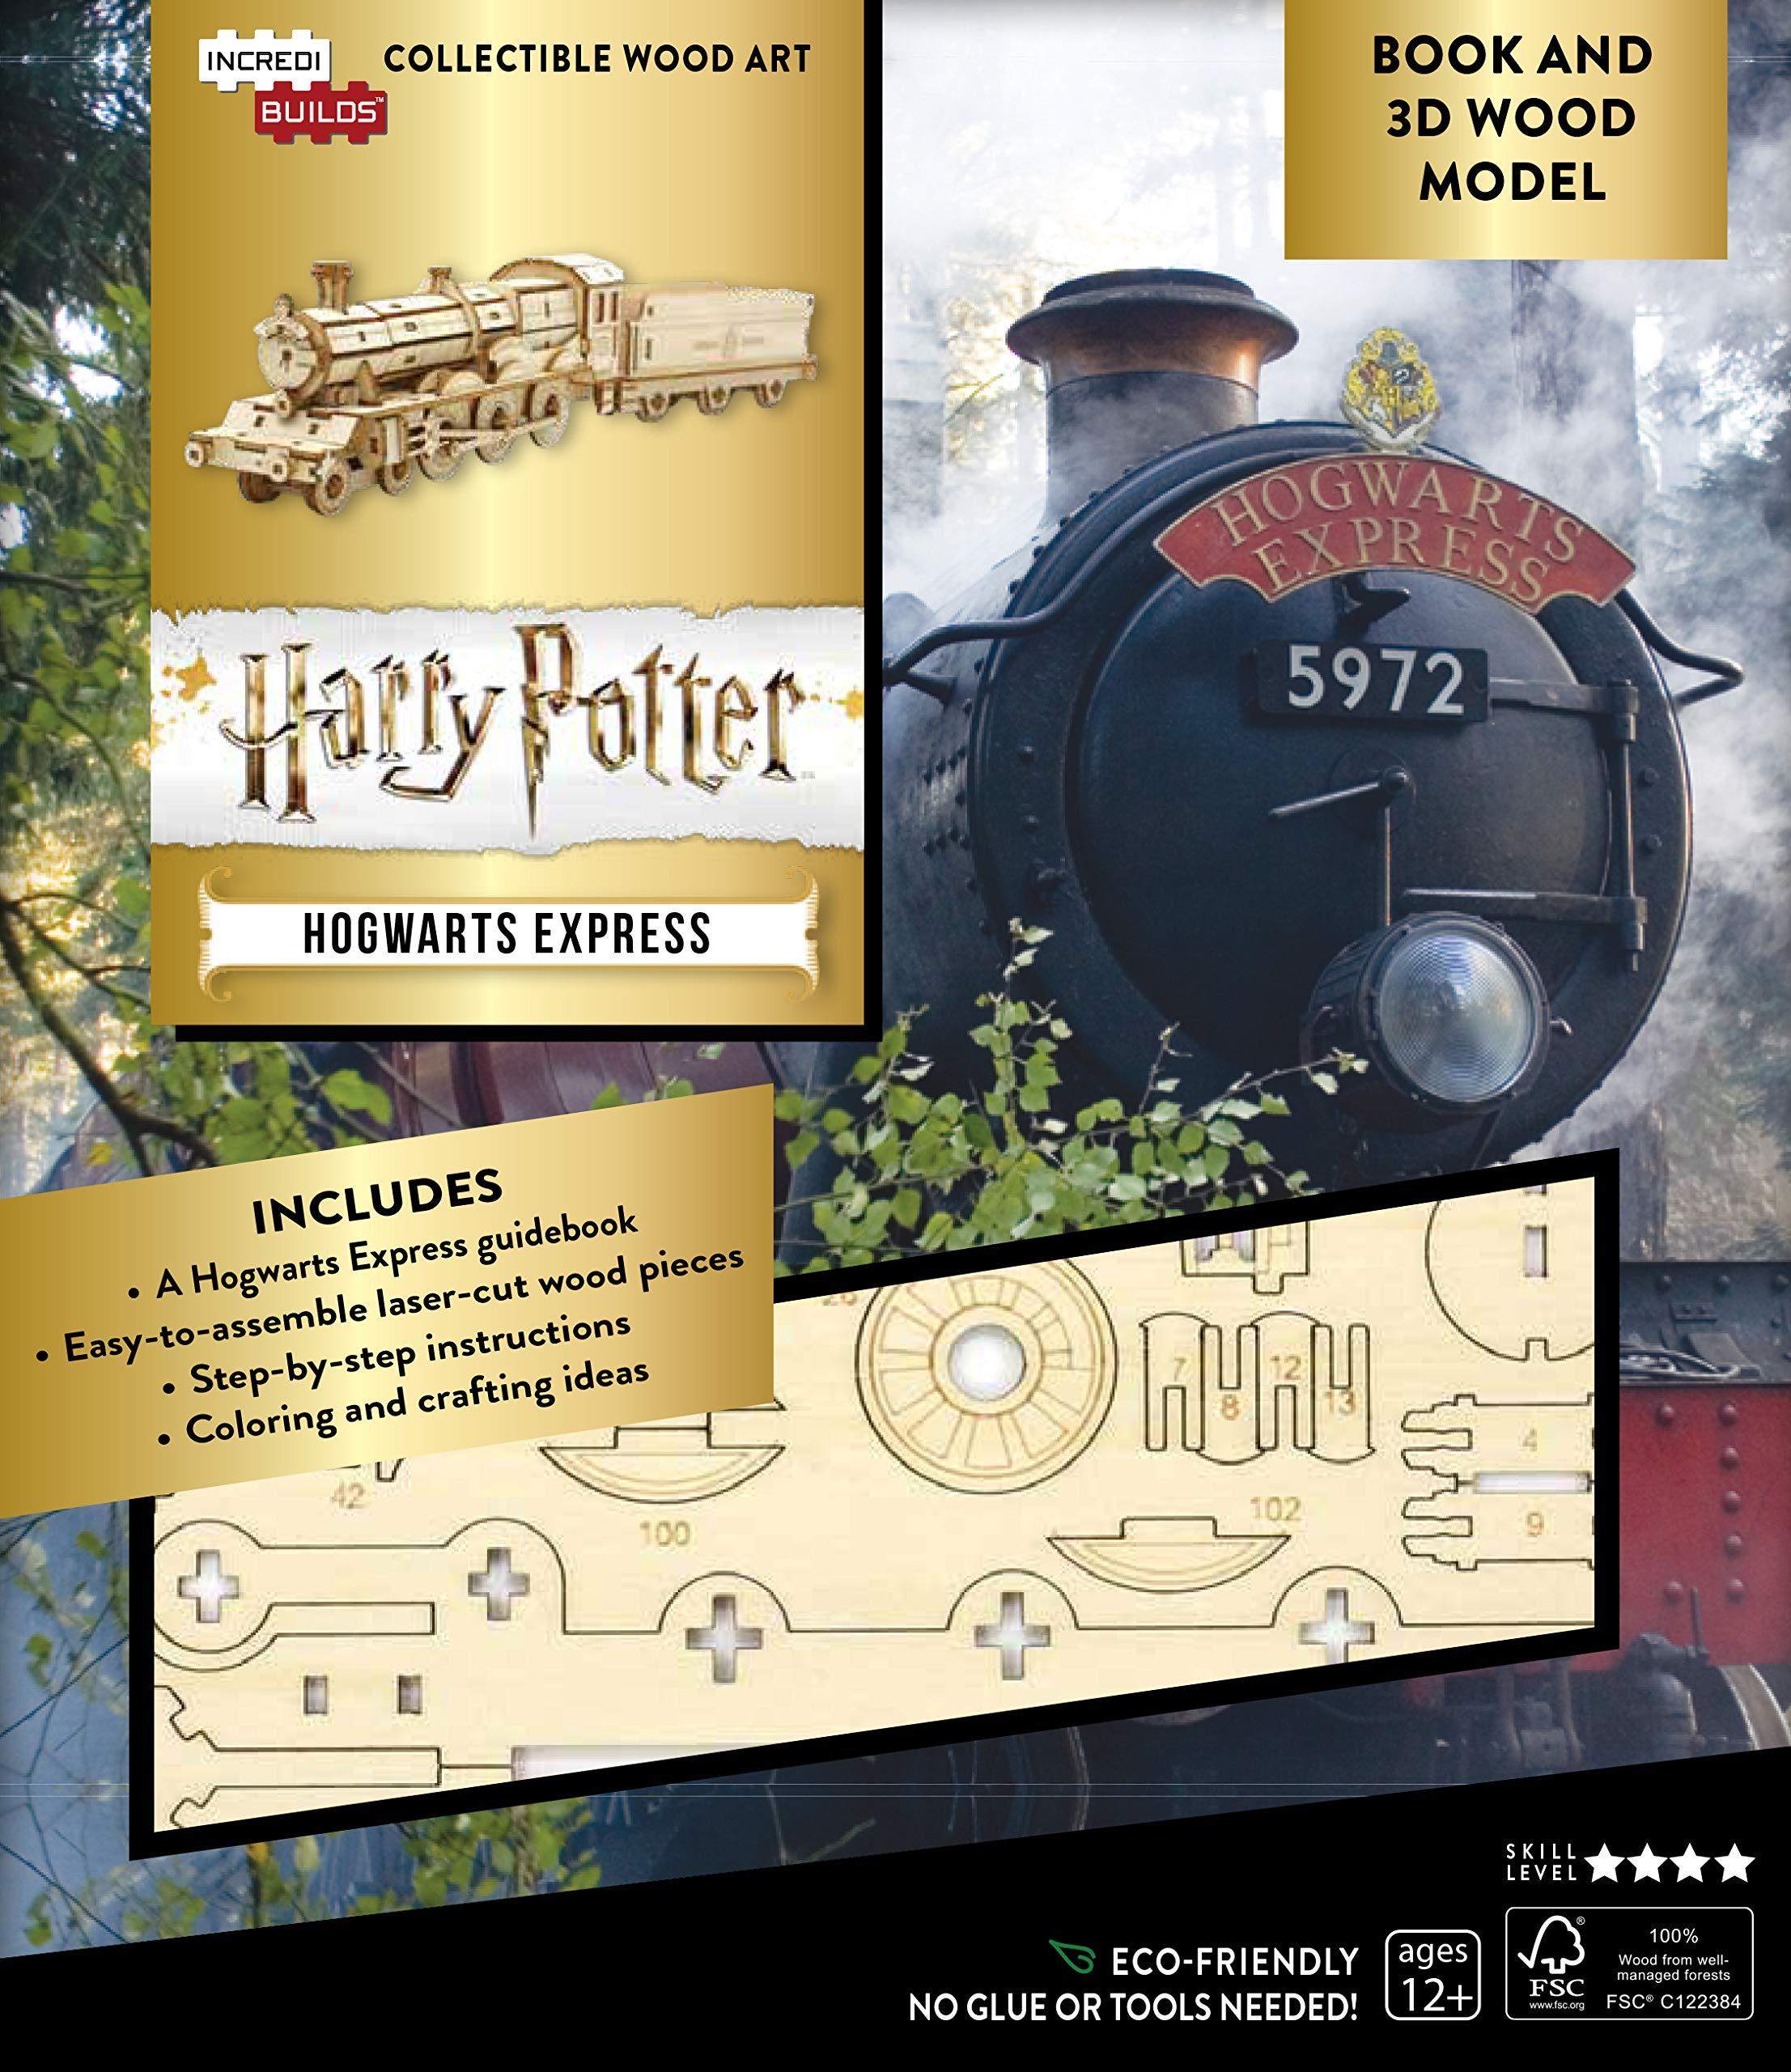 Macheta 3D - Harry Potter: Hogwarts Express Book and 3D Wood Model | Insight Editions